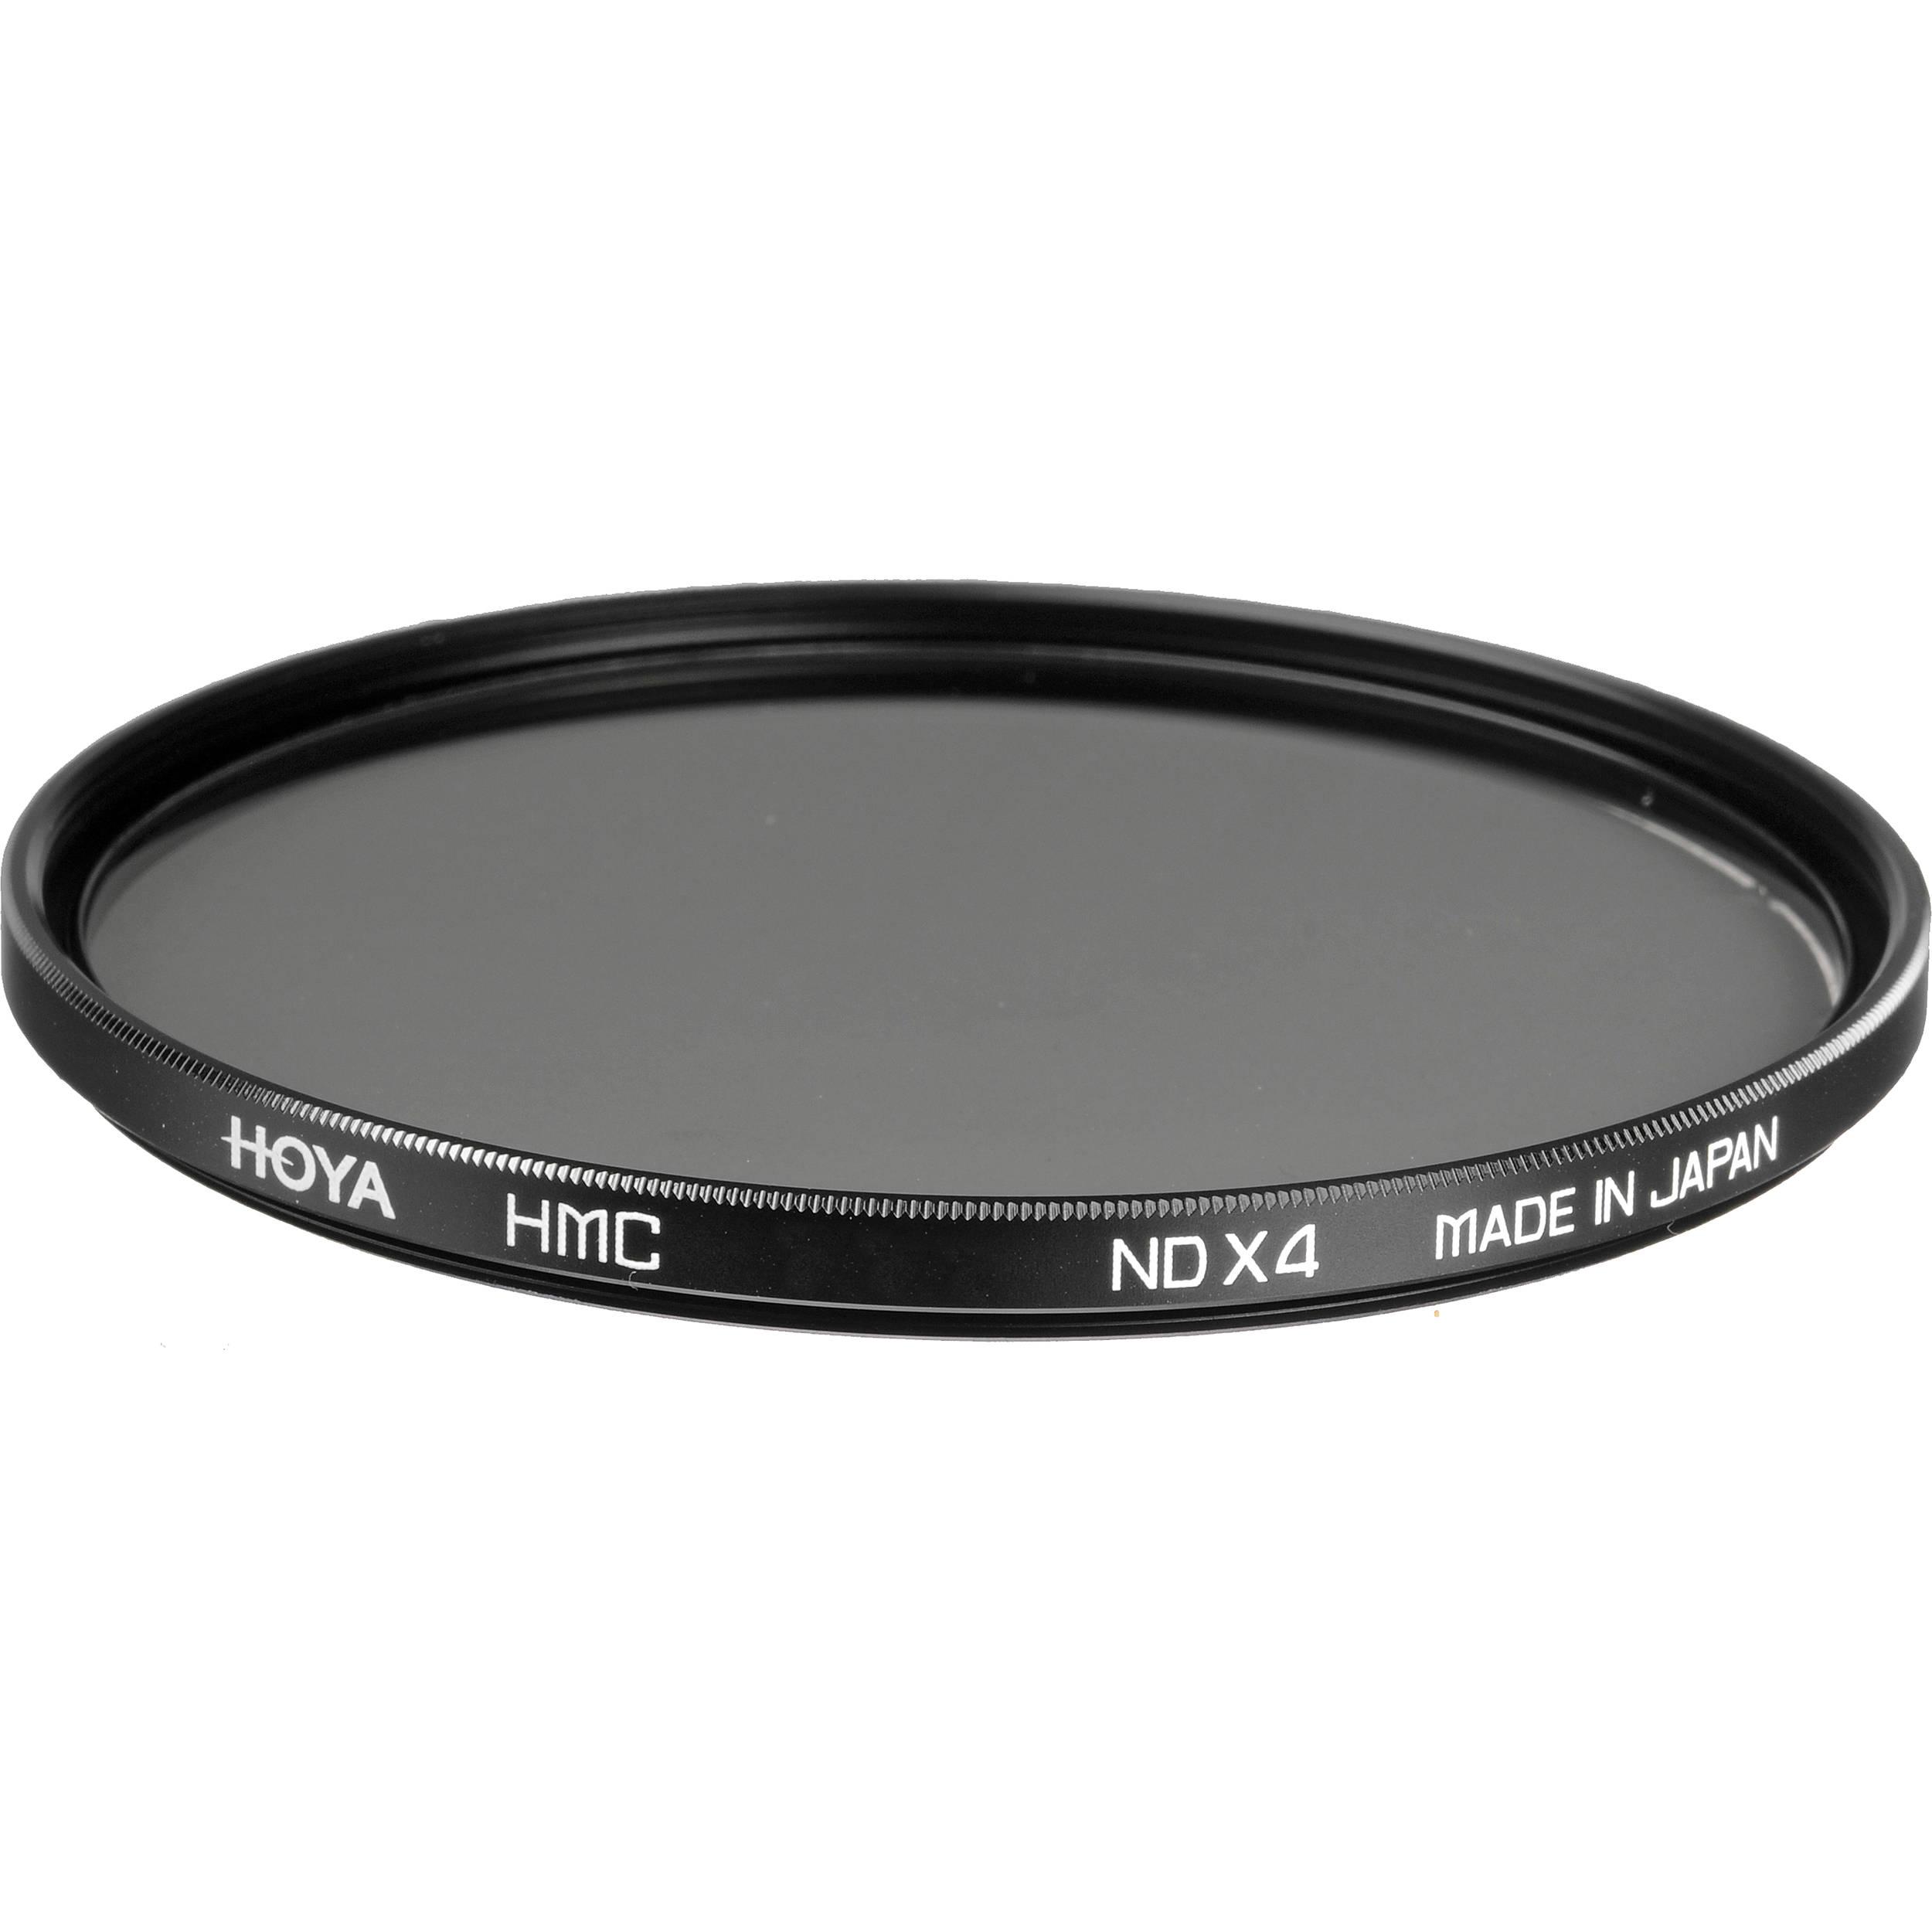 Hoya HMC NDX4 Filter